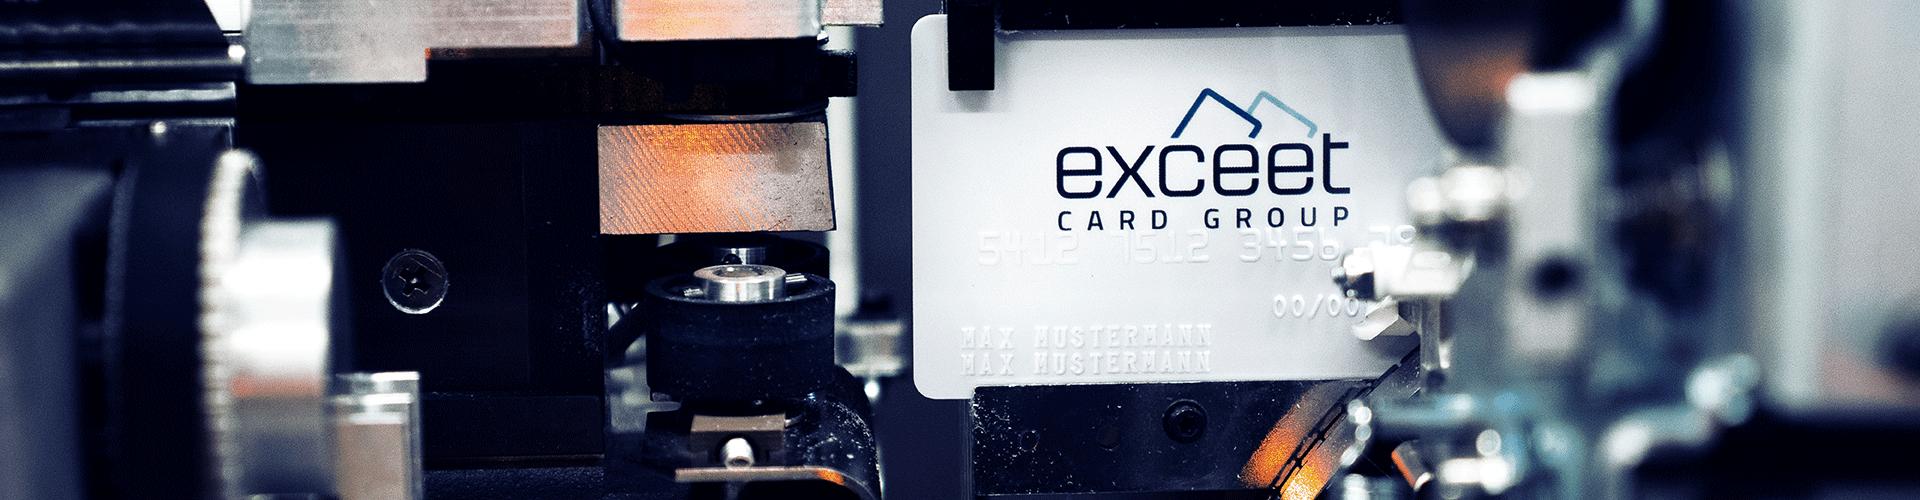 Karten, Plastikkarten, RFID-Karten, Dual-Interface Karten - exceet Card Group